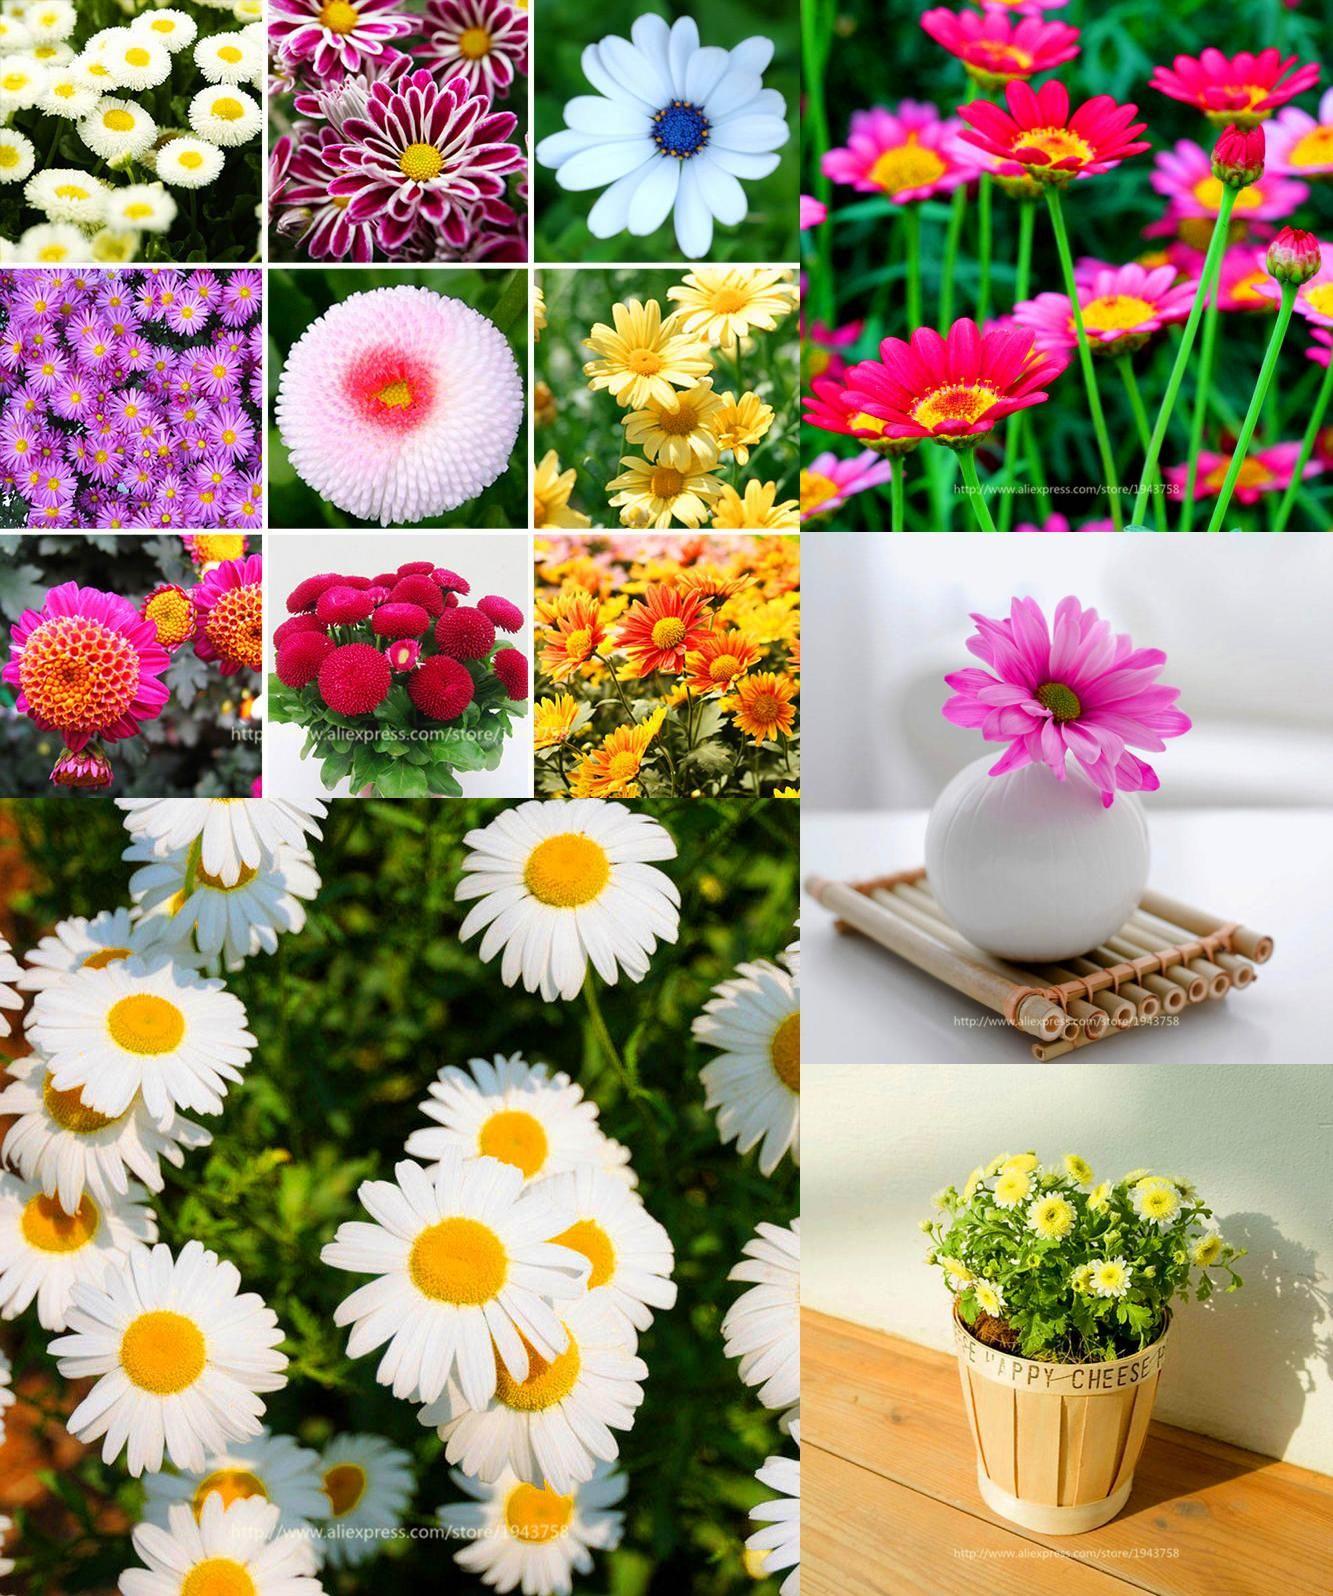 Visit To Buy 100pcs Daisy Flower Seed Packet Of Vanilla Ice Cream